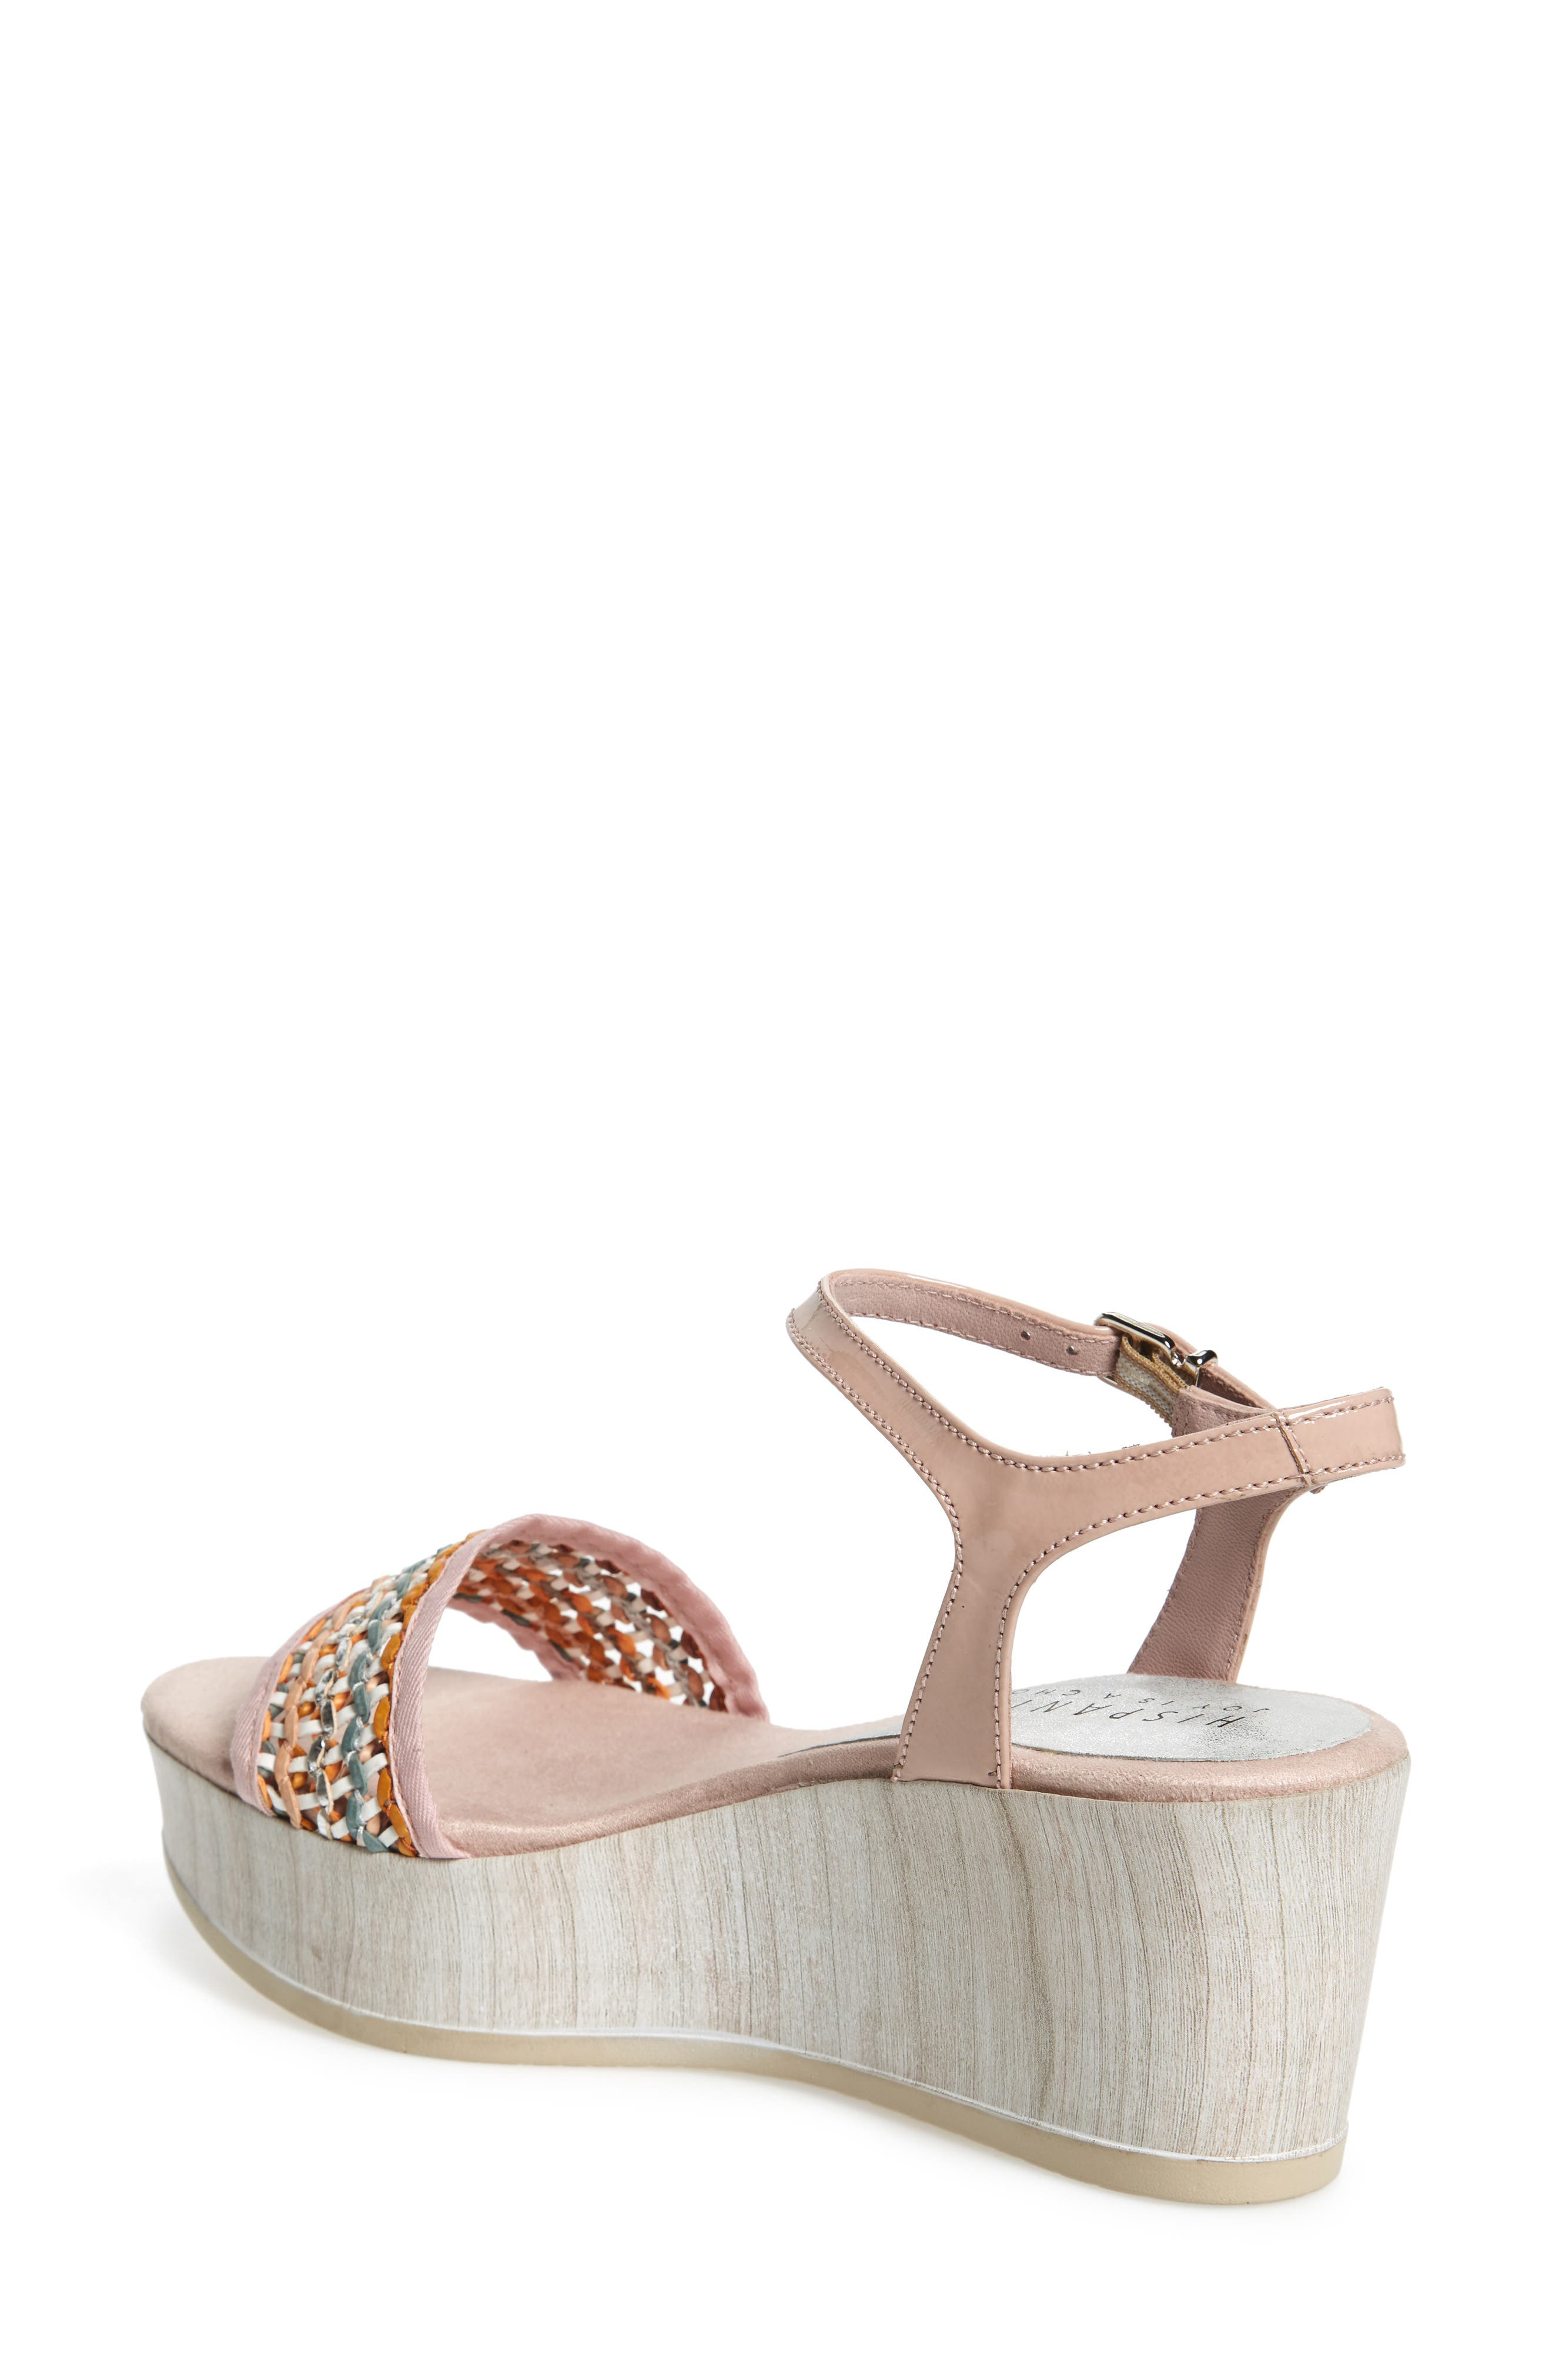 Colbi Platform Wedge Sandal,                             Alternate thumbnail 2, color,                             Amalfittana Leather